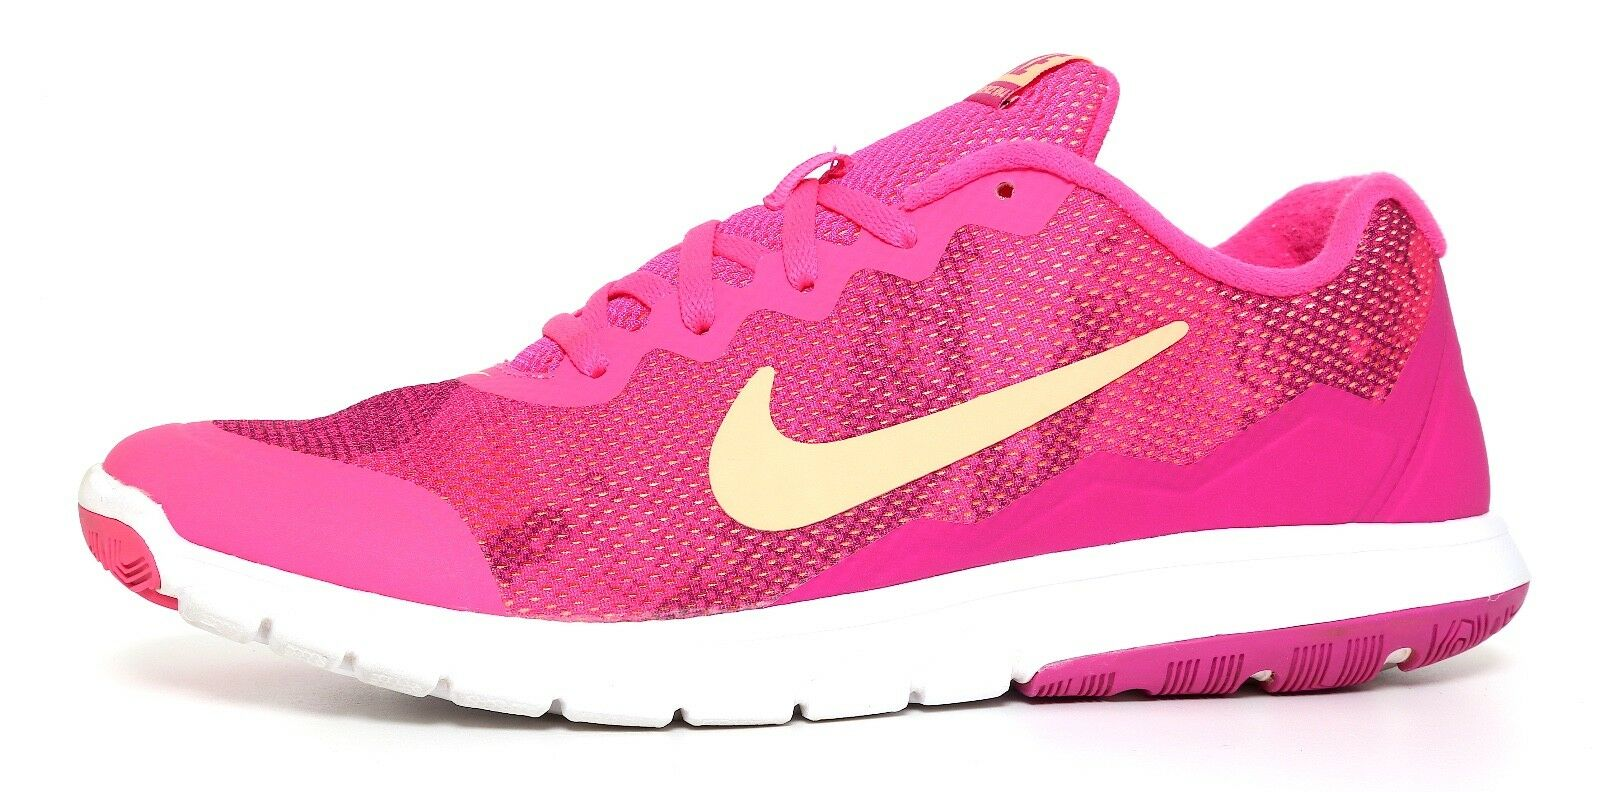 Nike Flex Experience Run 4 Sneakers Fuchsia Pink Women Sz 9.5 2412